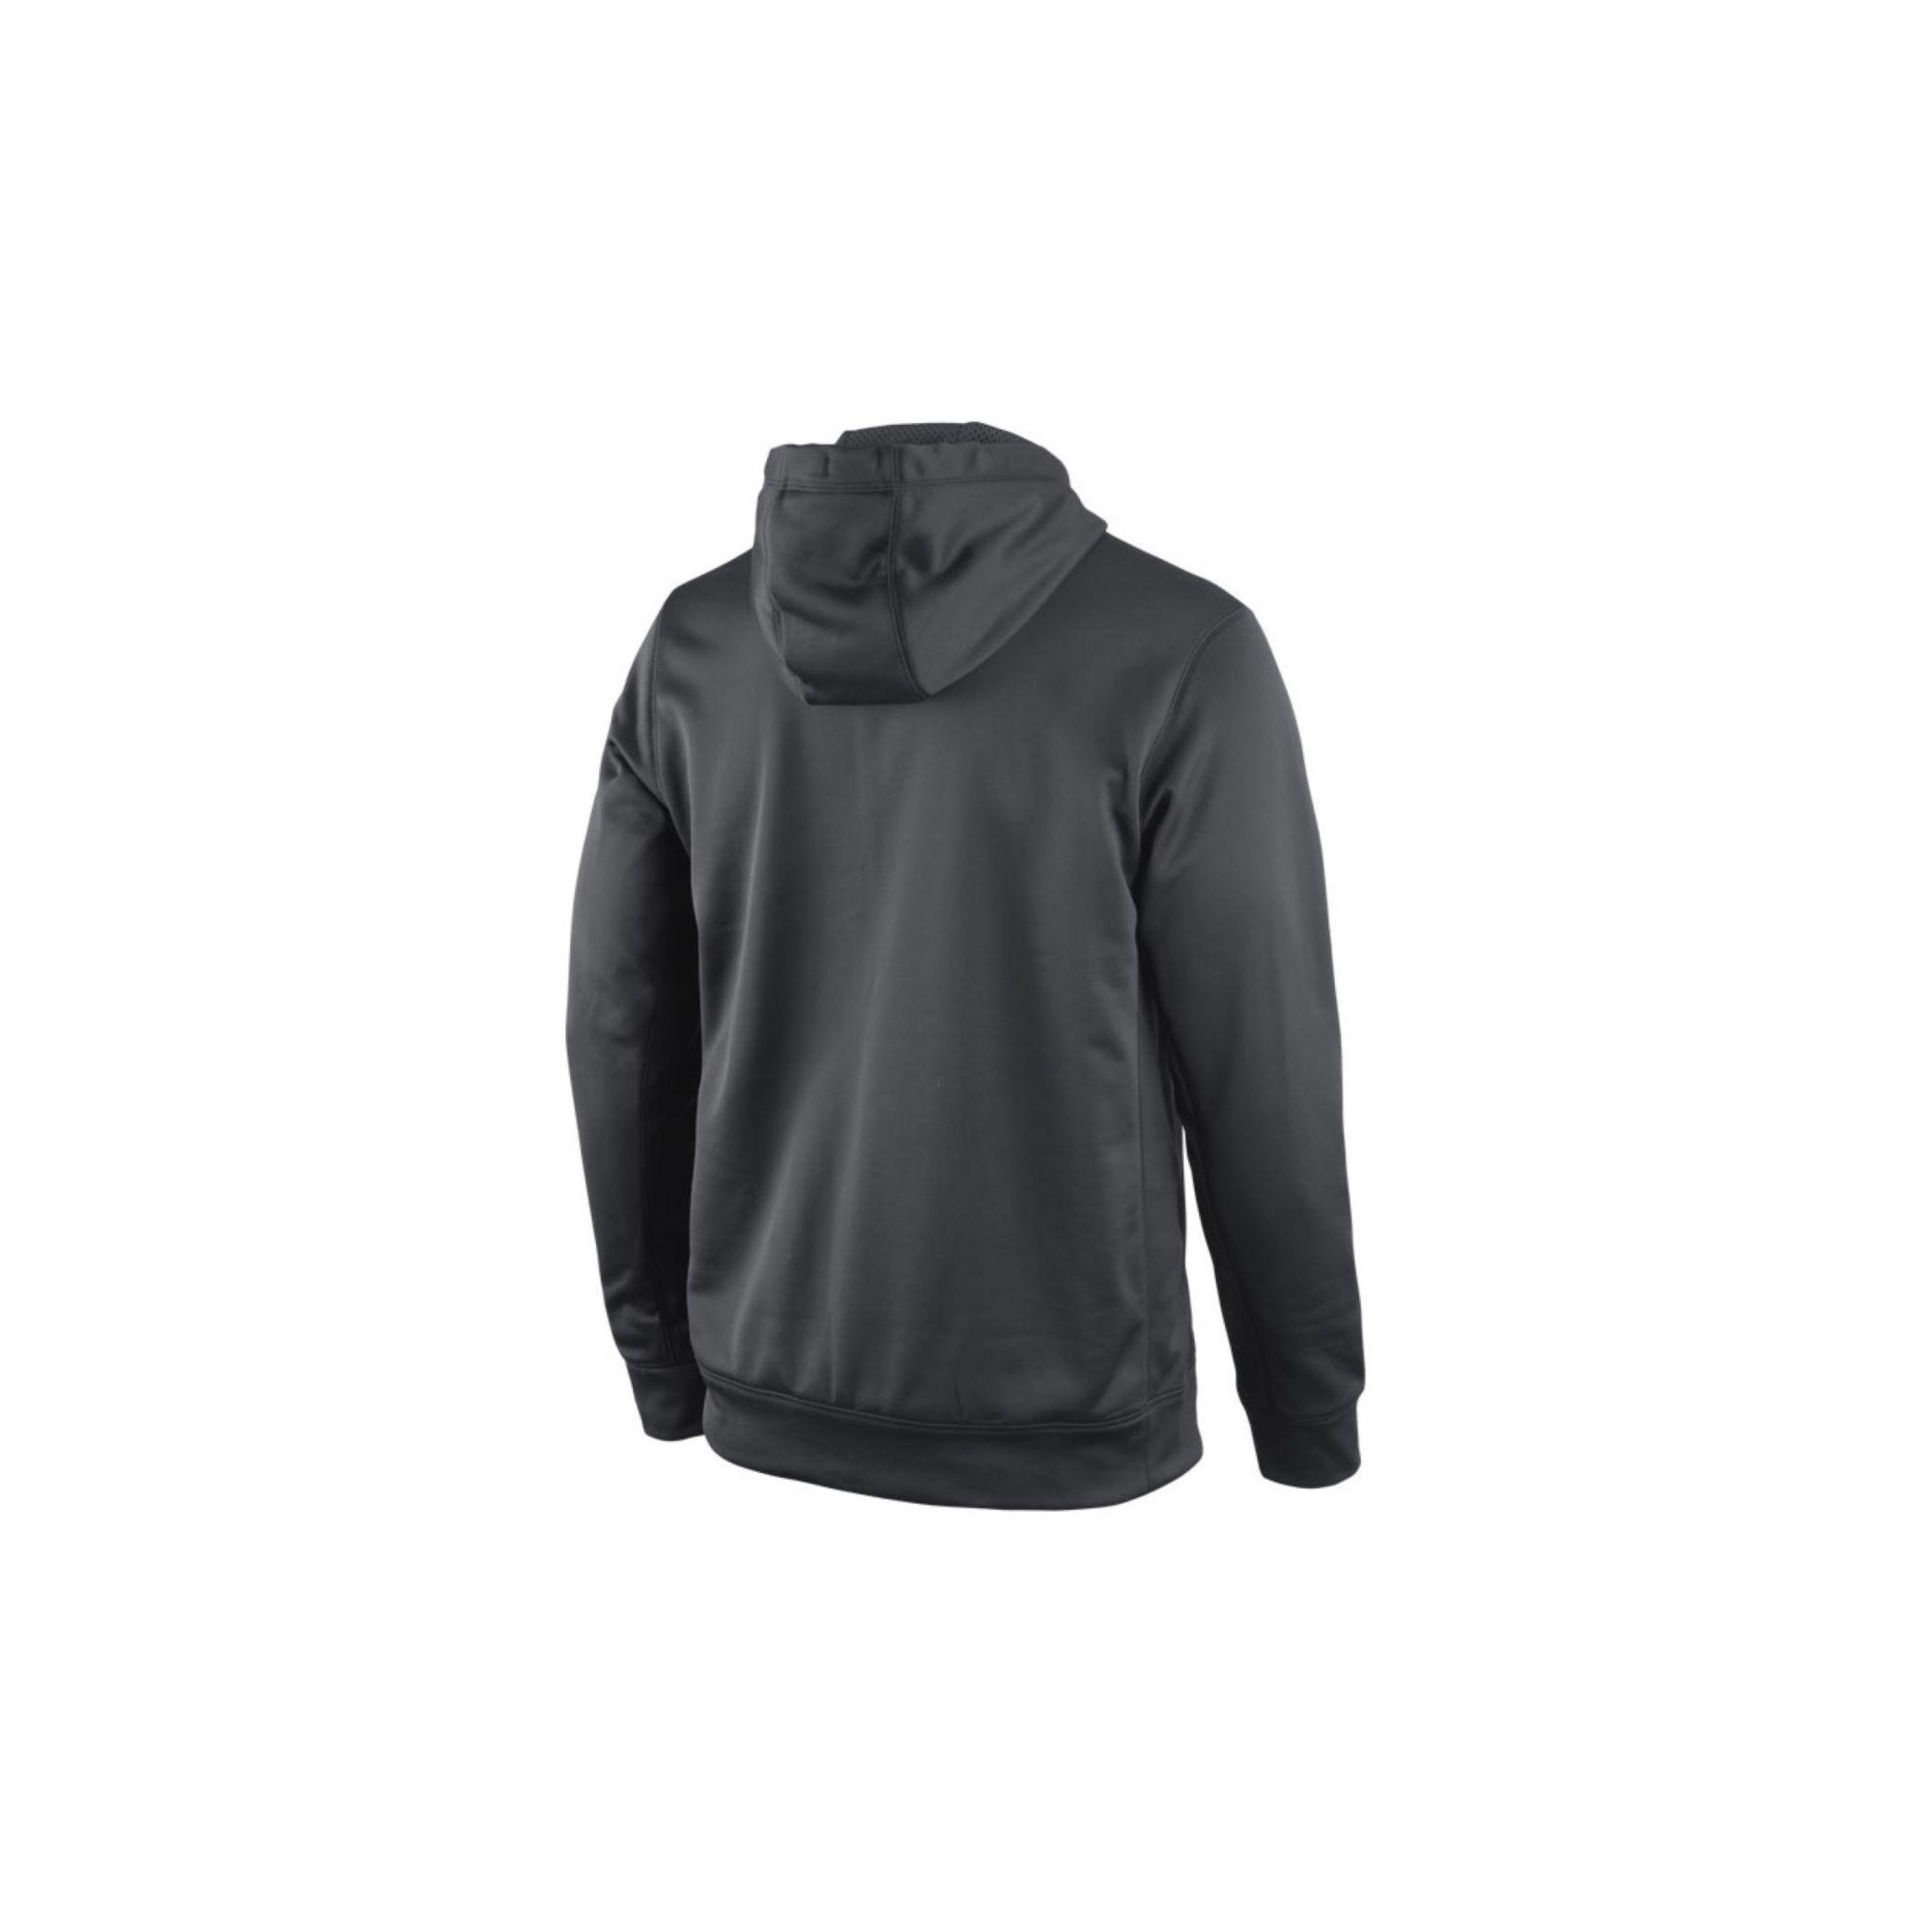 5410aff3e0e9 Lyst - Nike Mens New England Patriots Platinum Ko Hoodie in Gray for Men